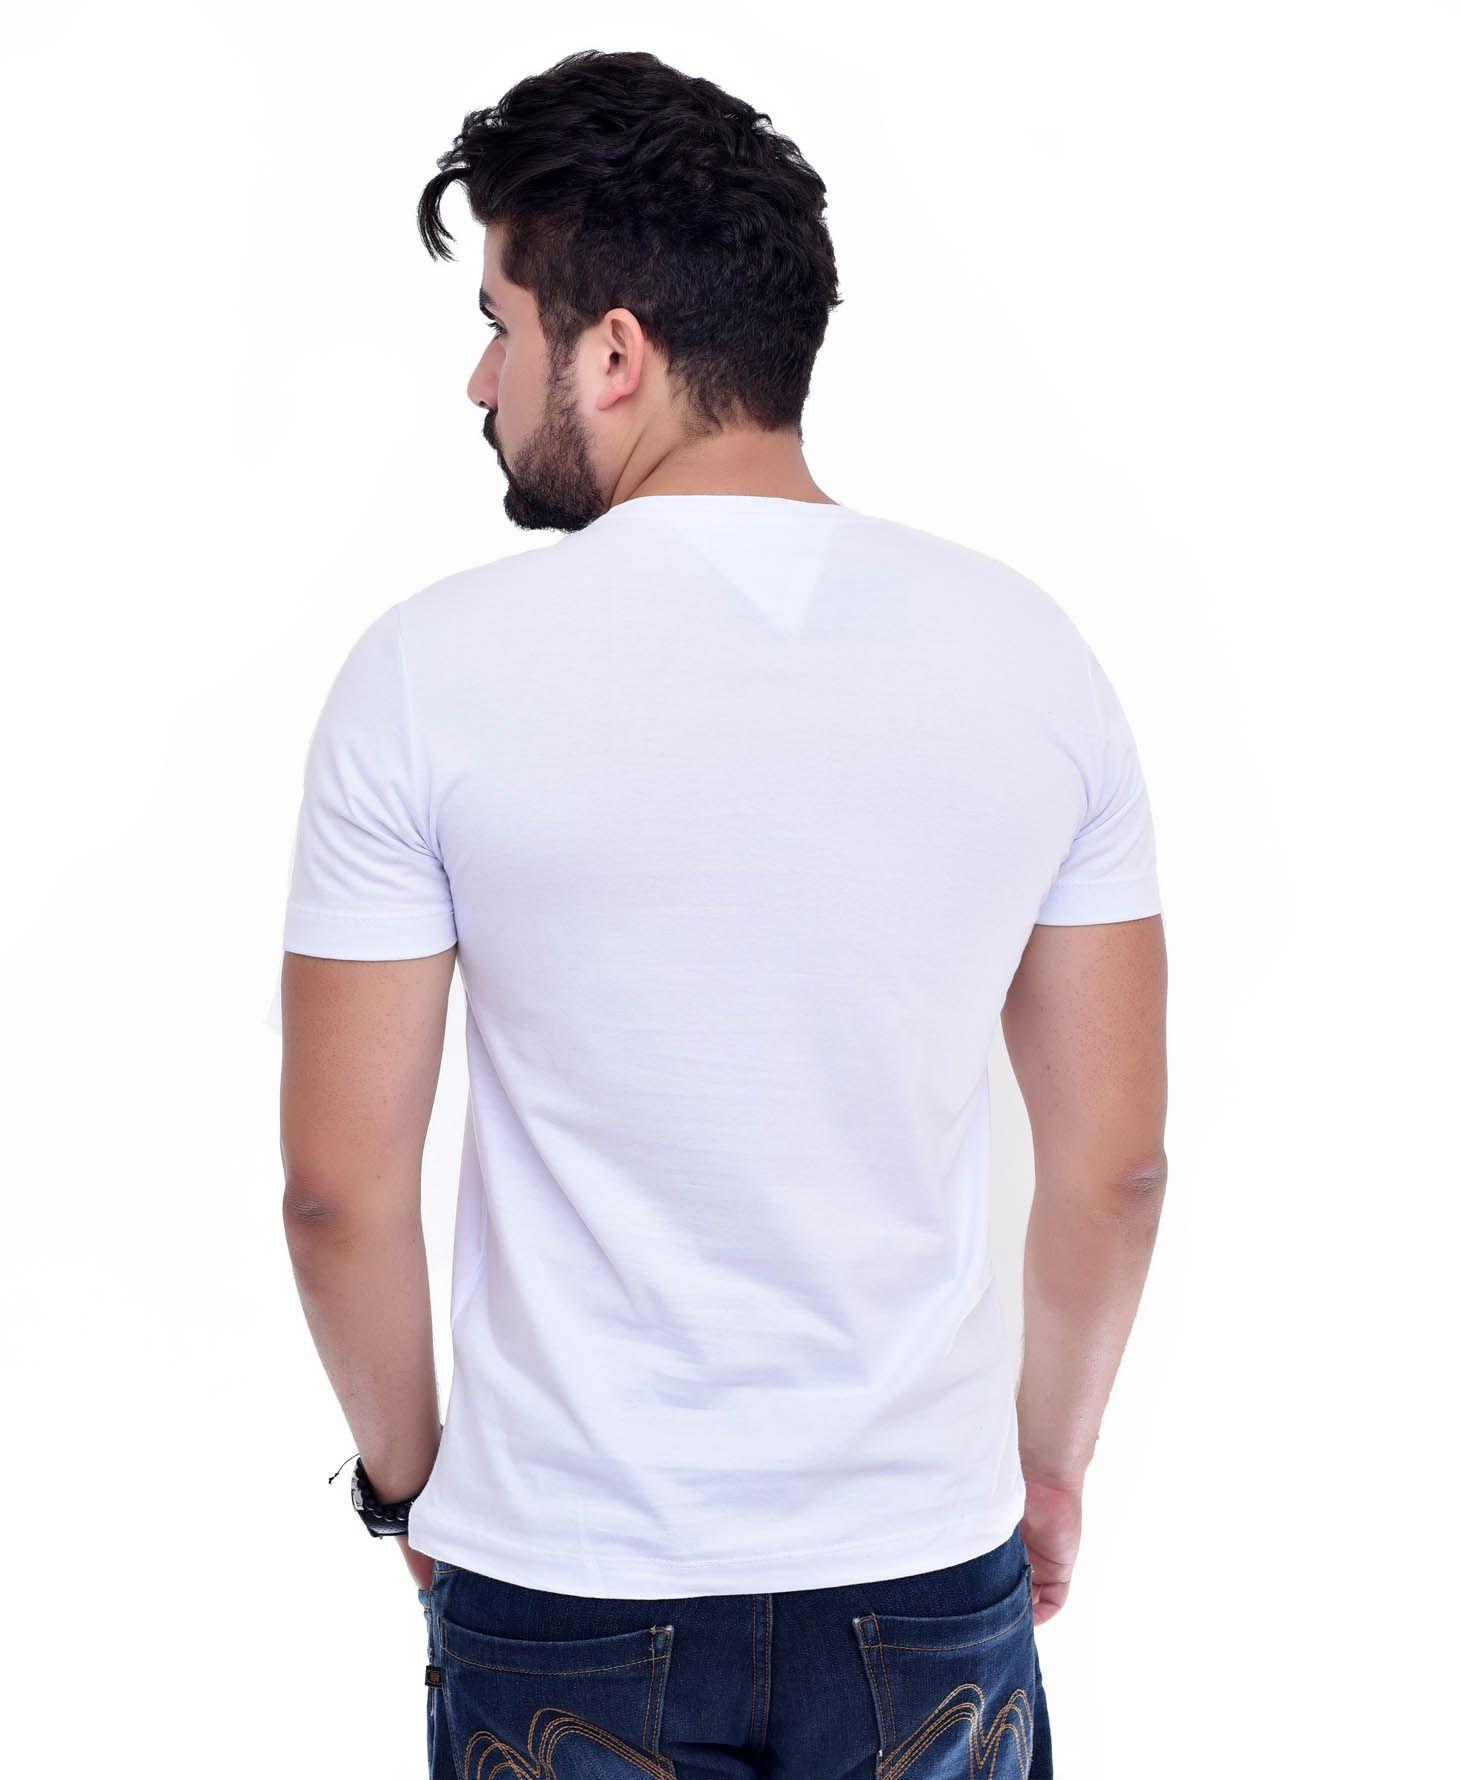 Camiseta Boldo TH Branco / Marinho  - Ca Brasileira